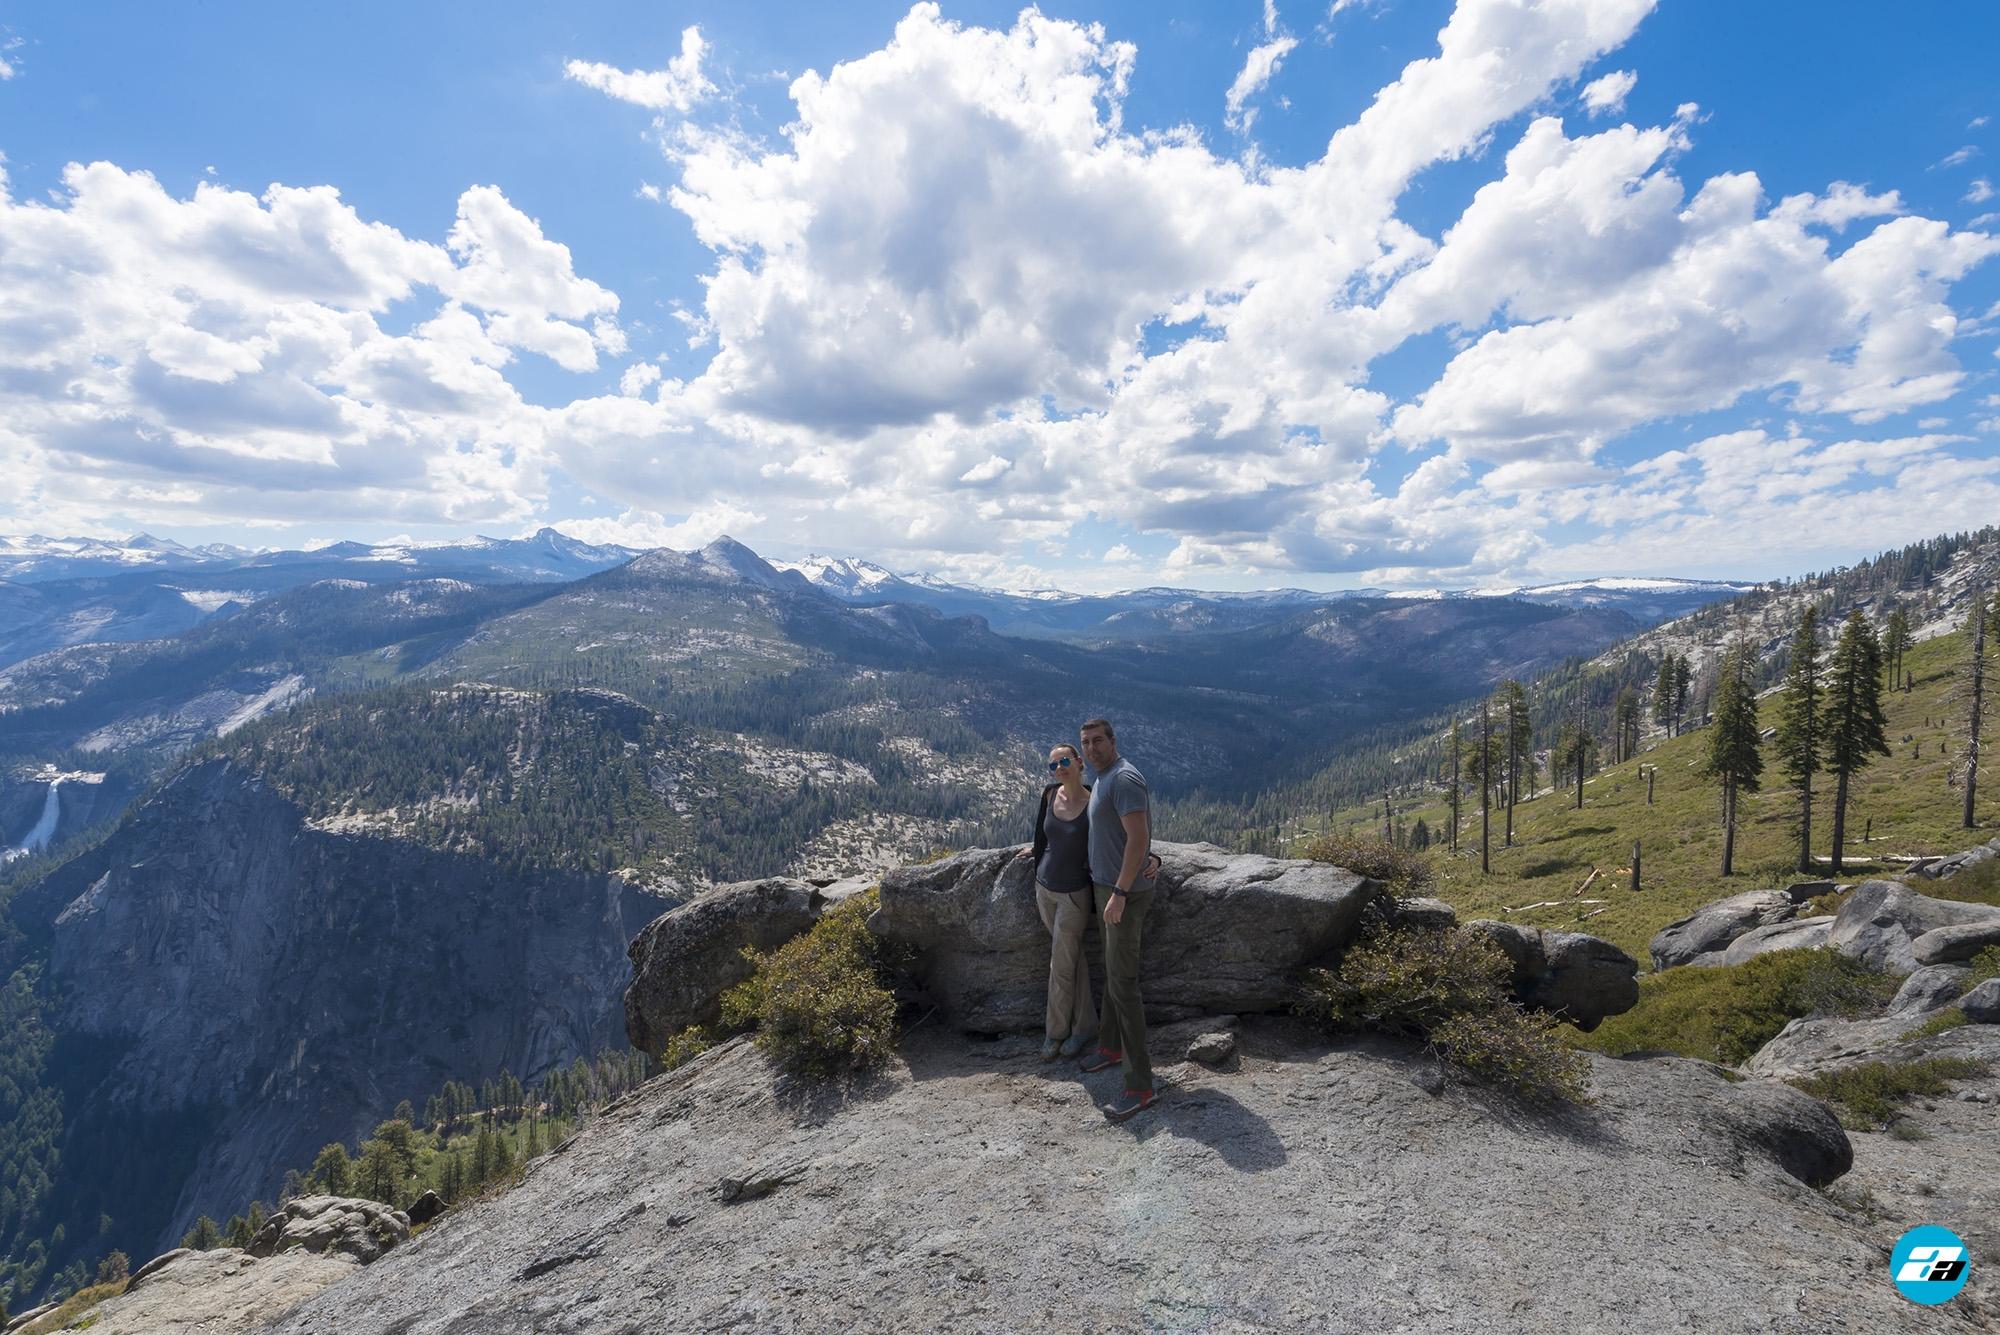 Yosemite National Park, California, USA. Landscape. Couple. Solitude. Mountain View. Glacier Point